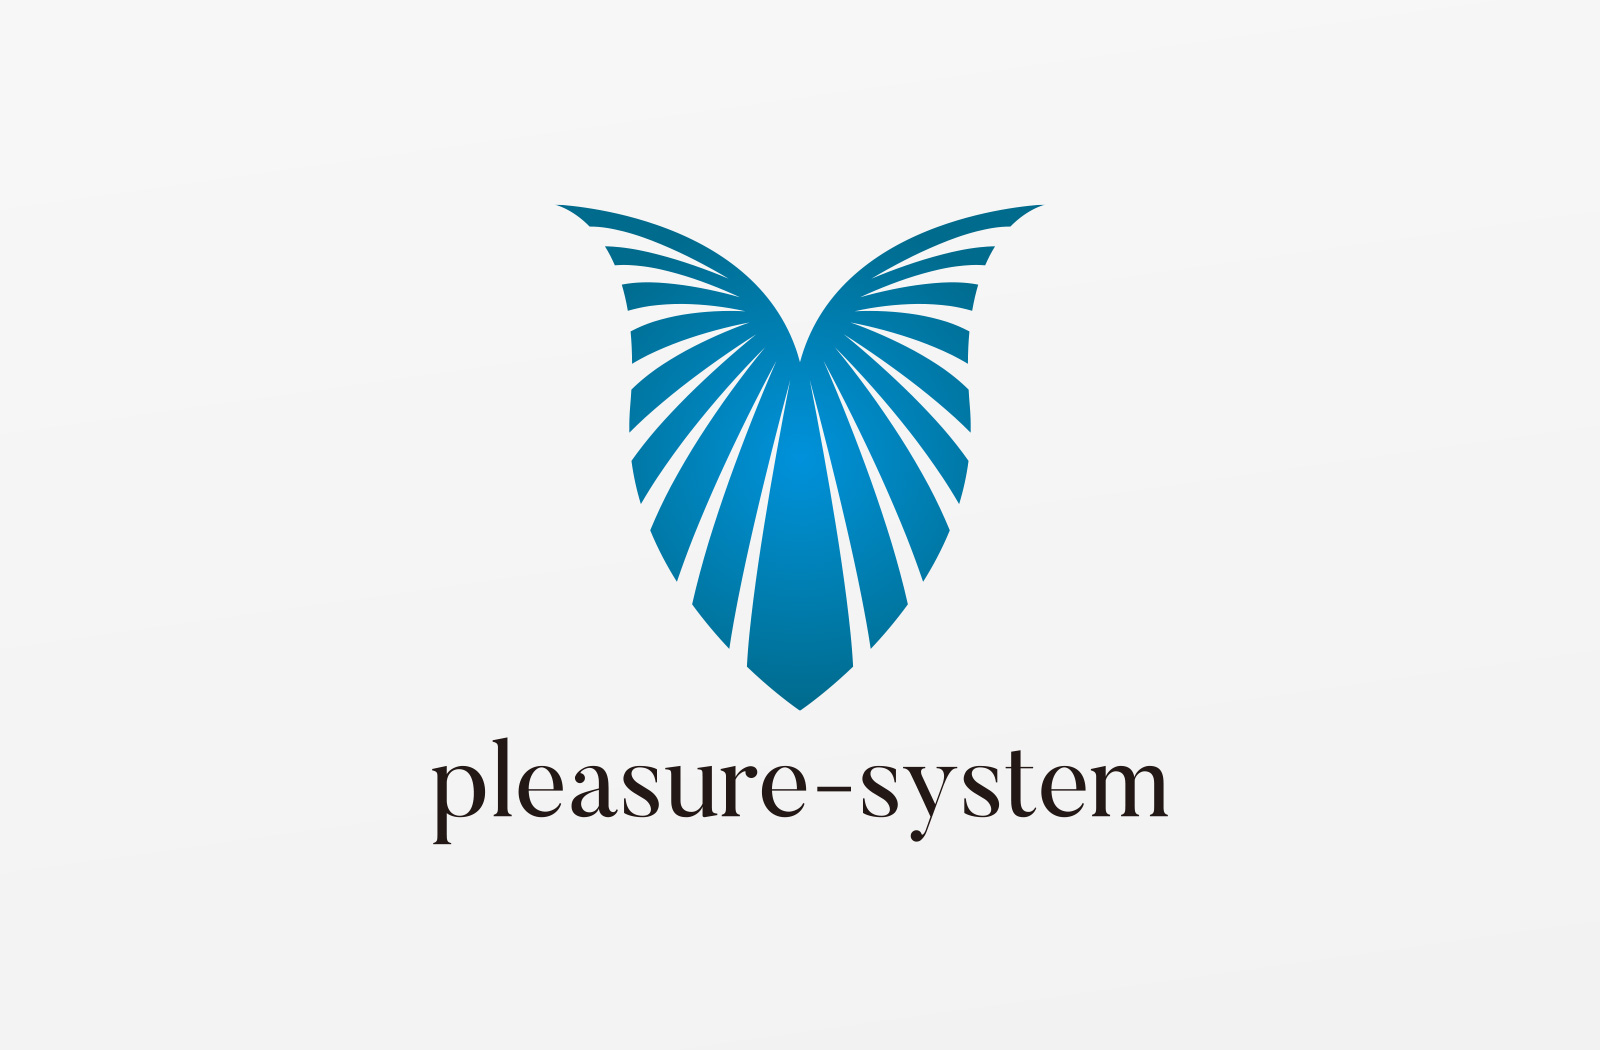 pleasure-system ロゴ